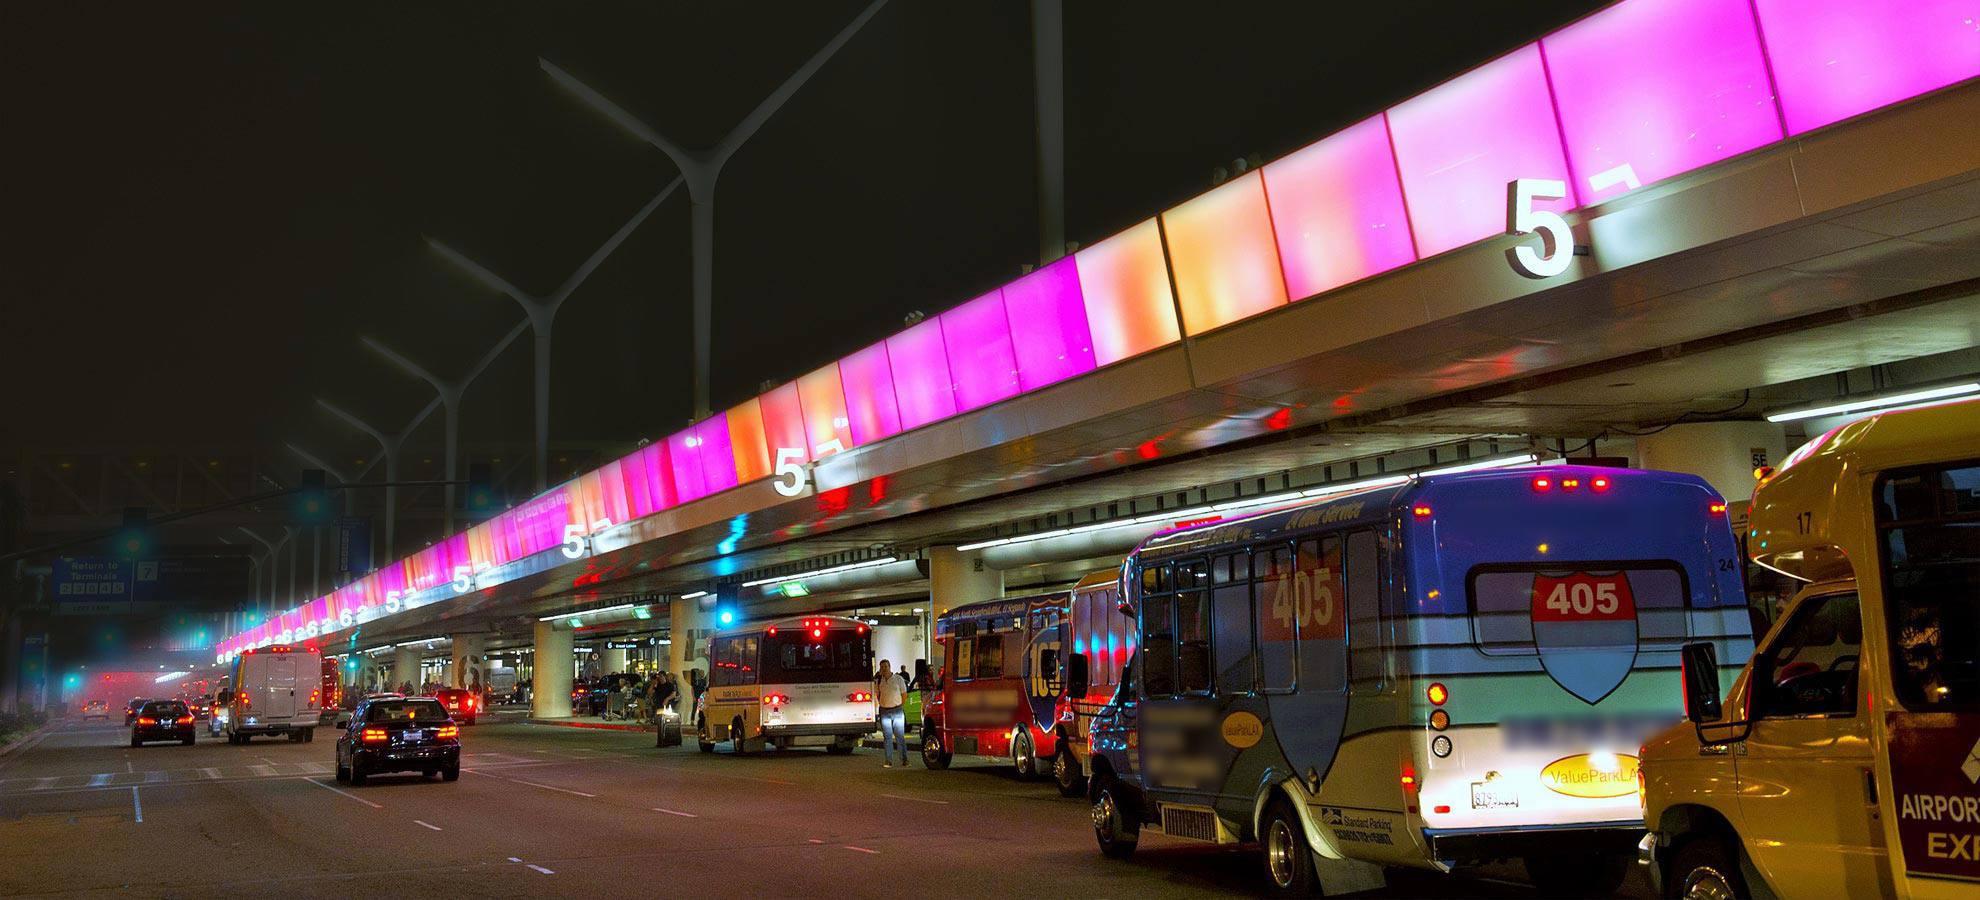 FlyAway drop off at Terminal 5 | Photo: LAX